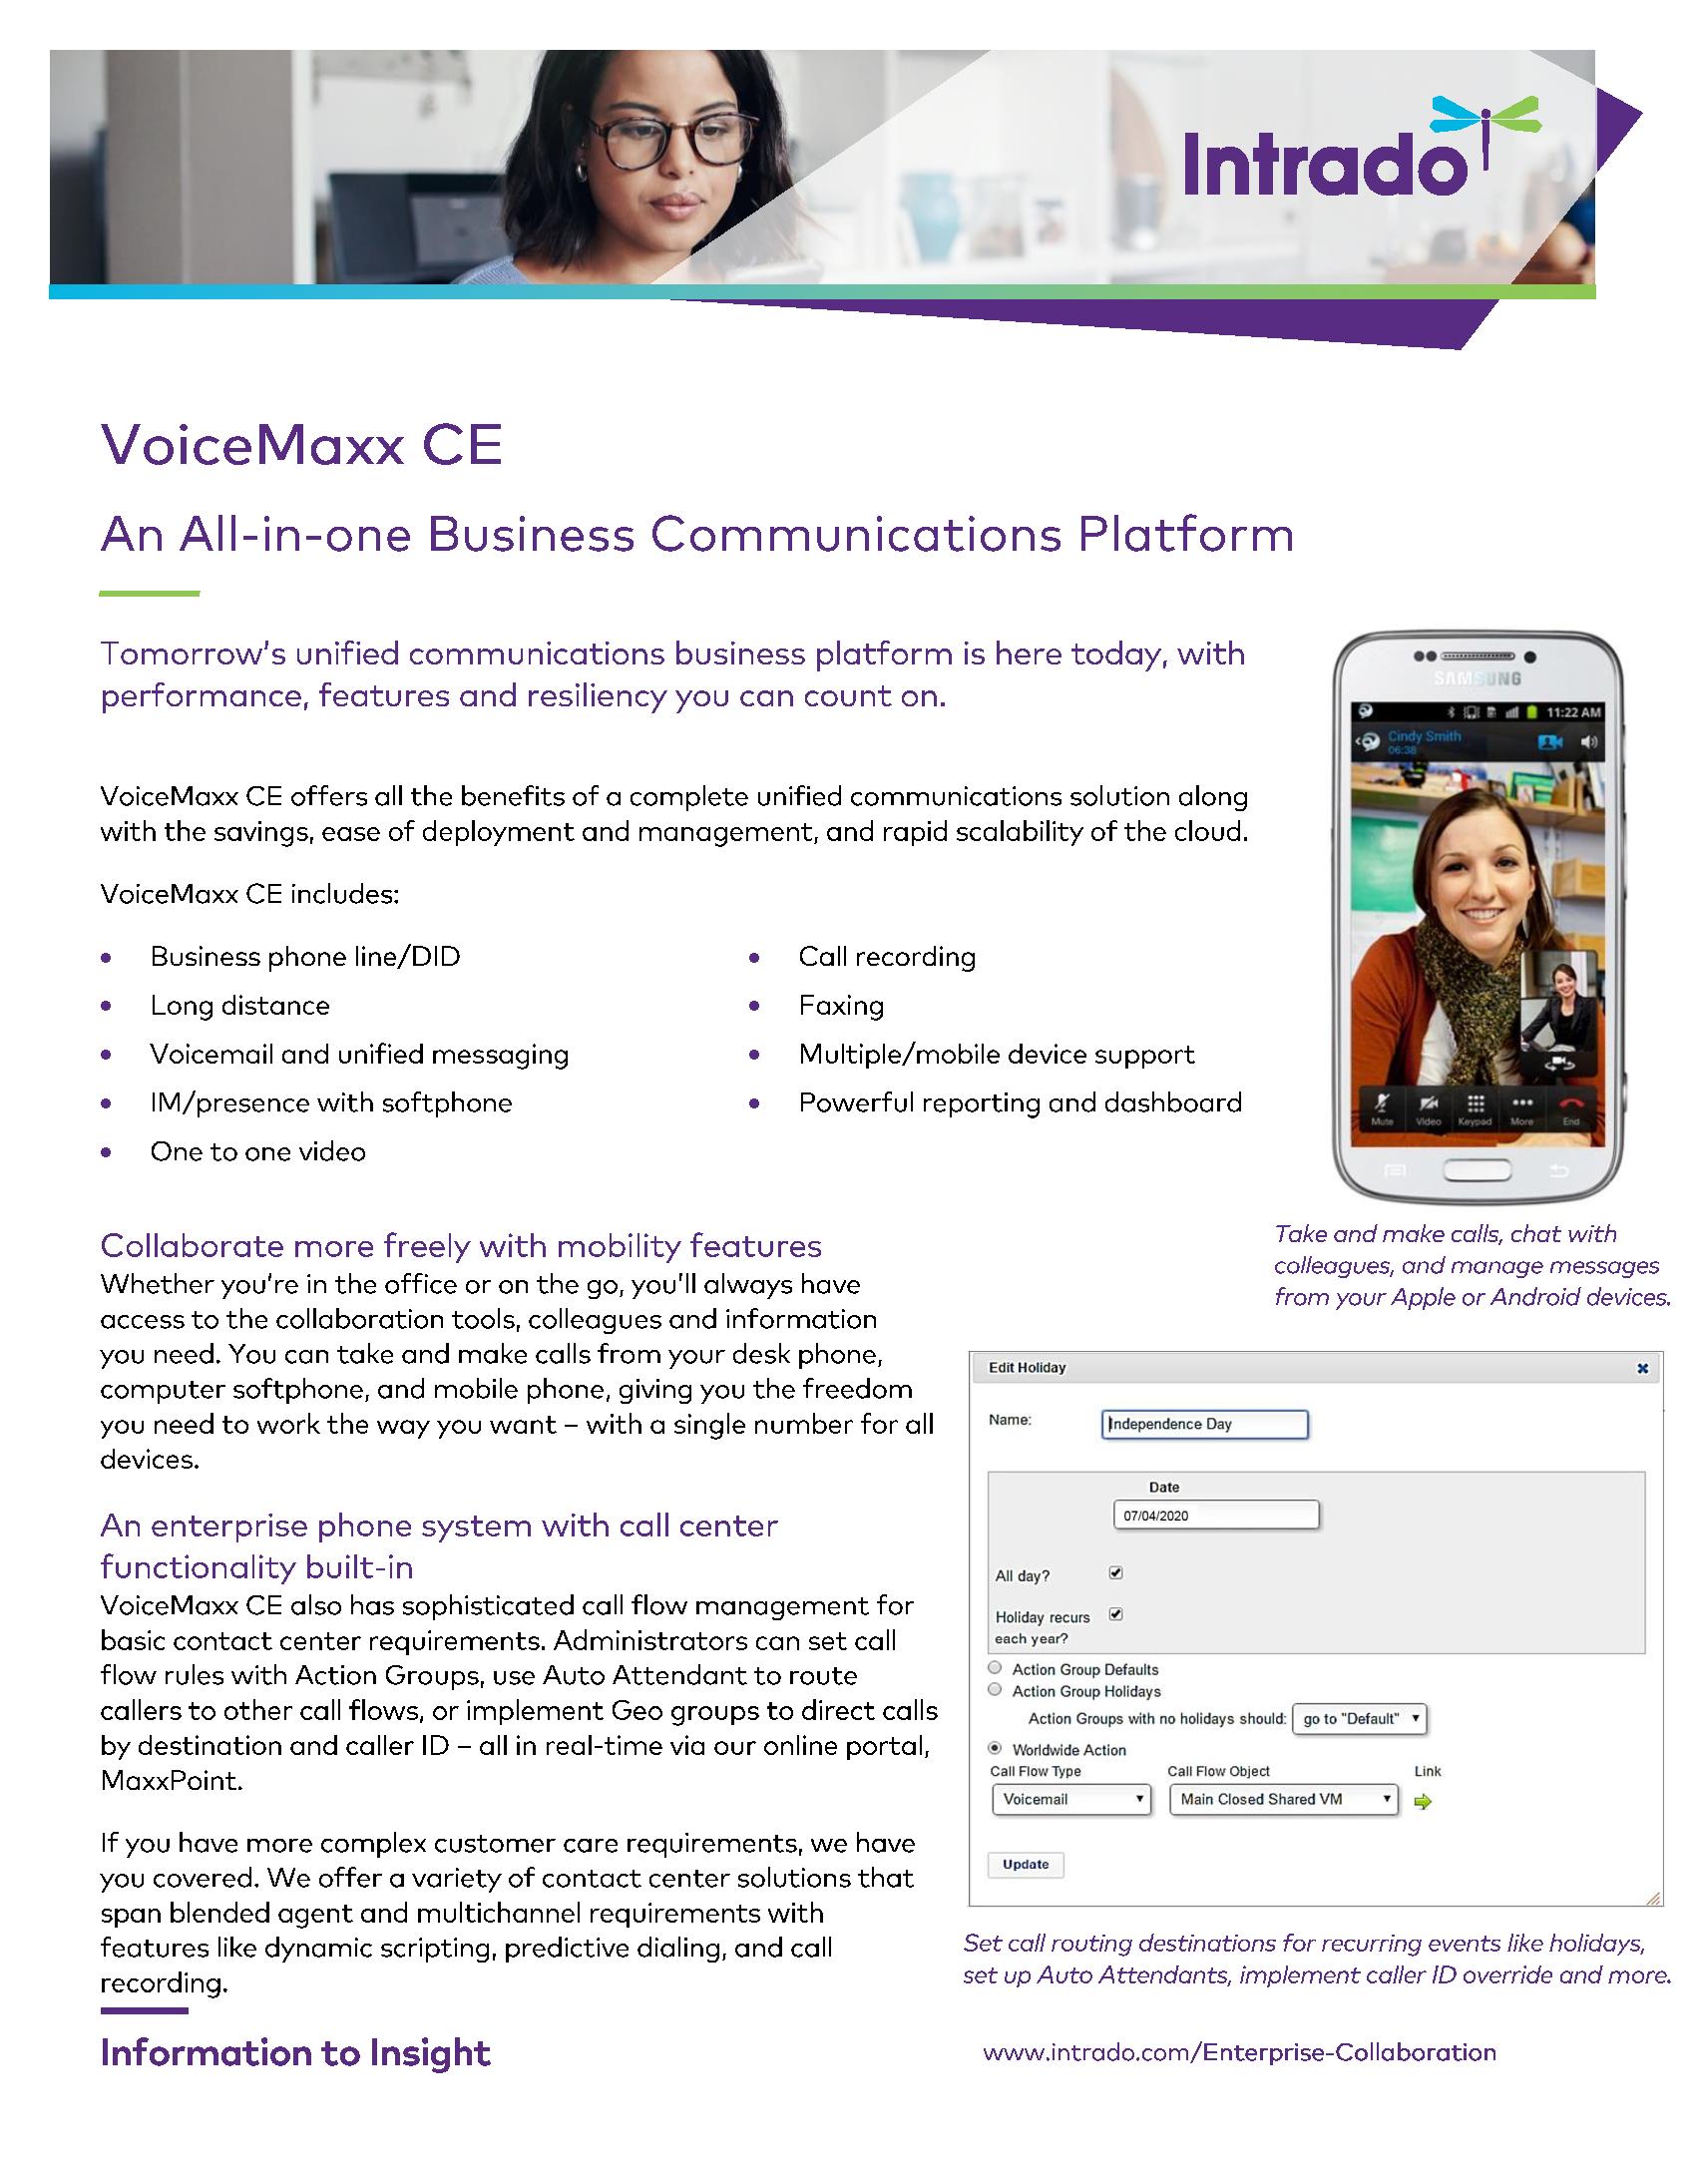 VoiceMaxx CE